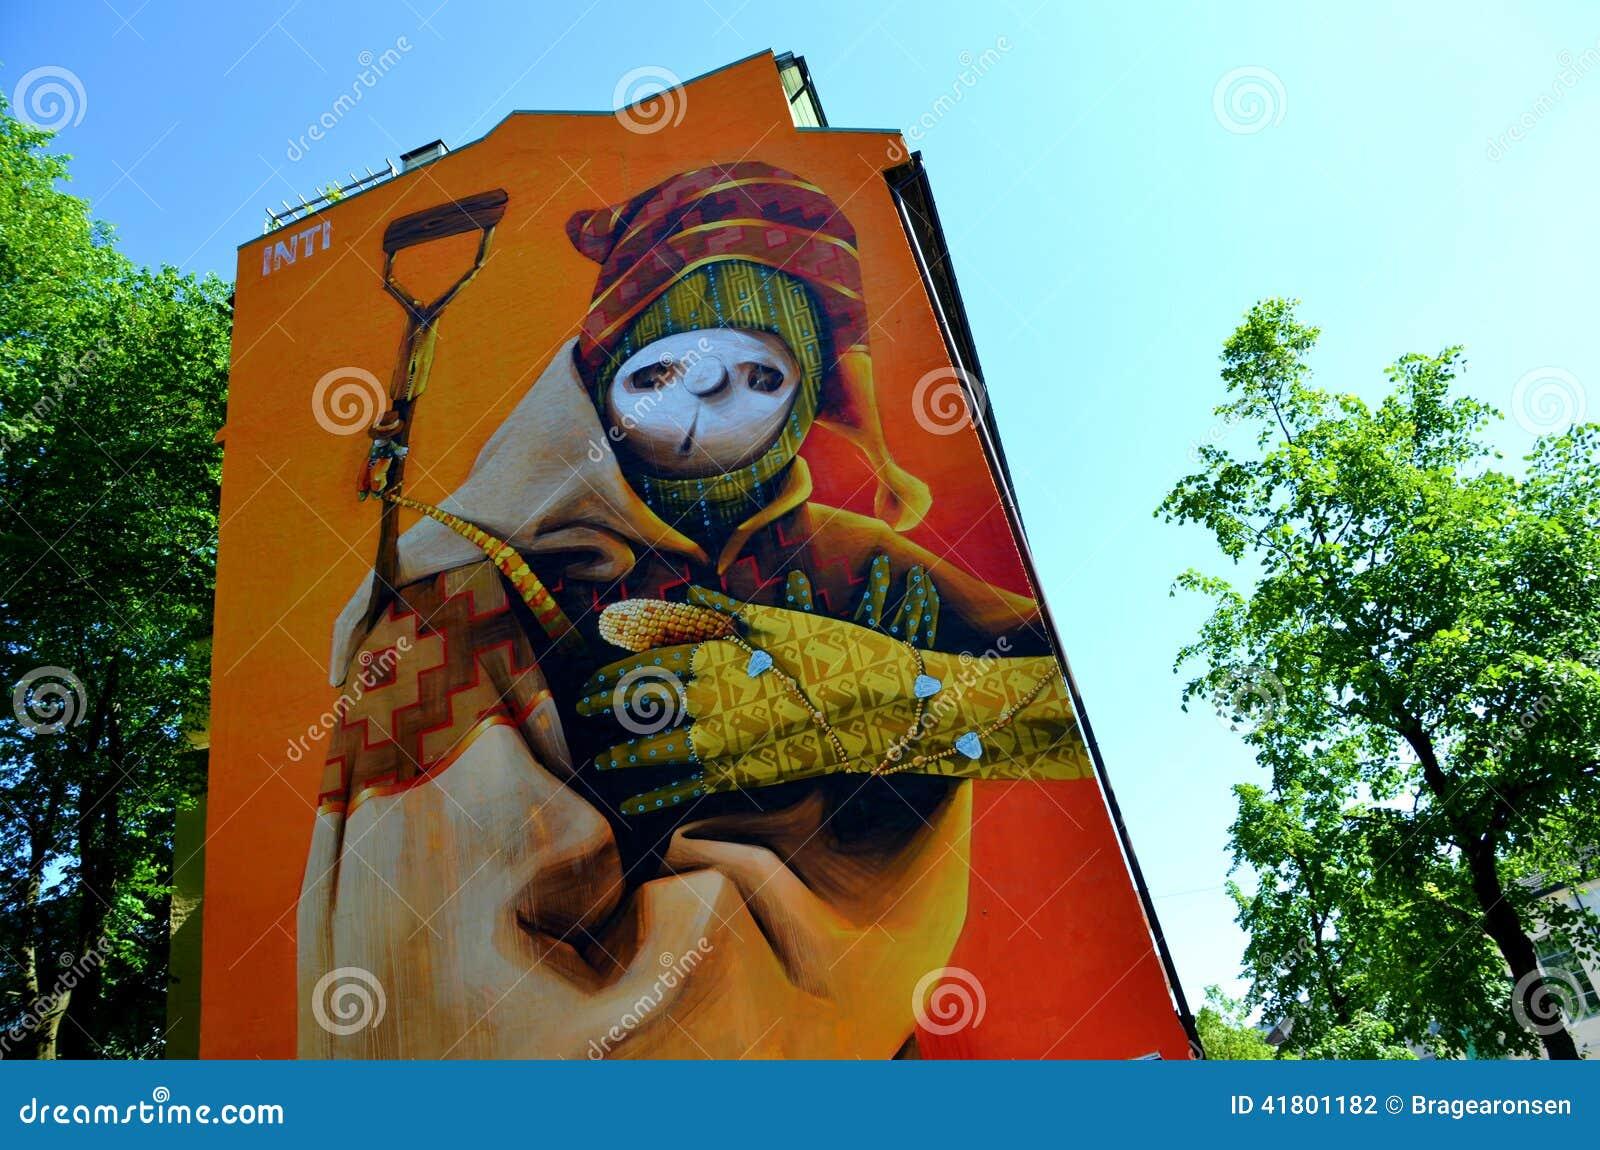 Grafitti art oslo - Artist Graffiti Inti Oslo